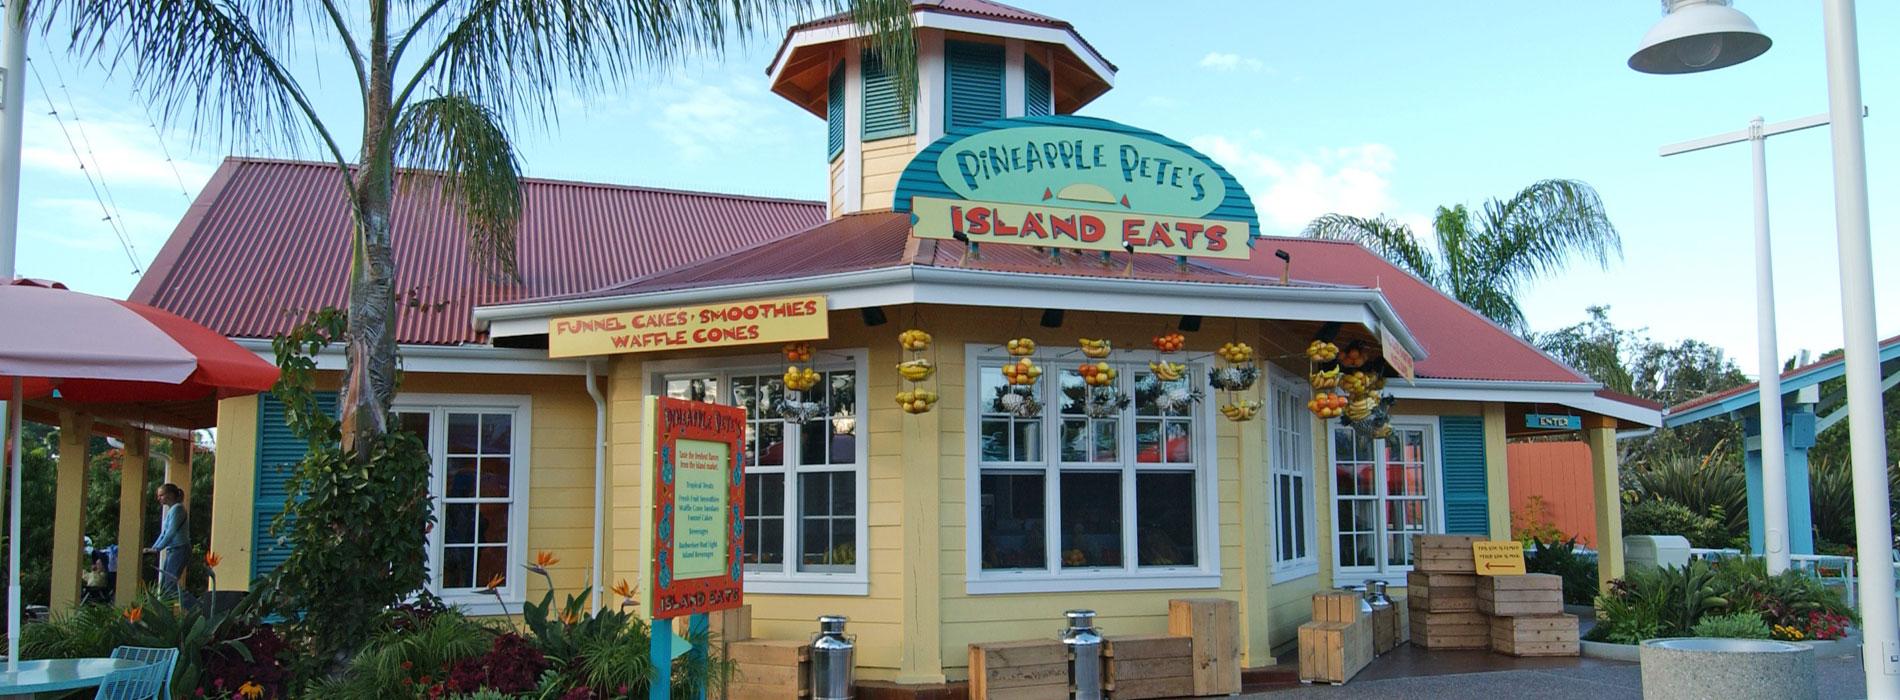 Pineapple Petes